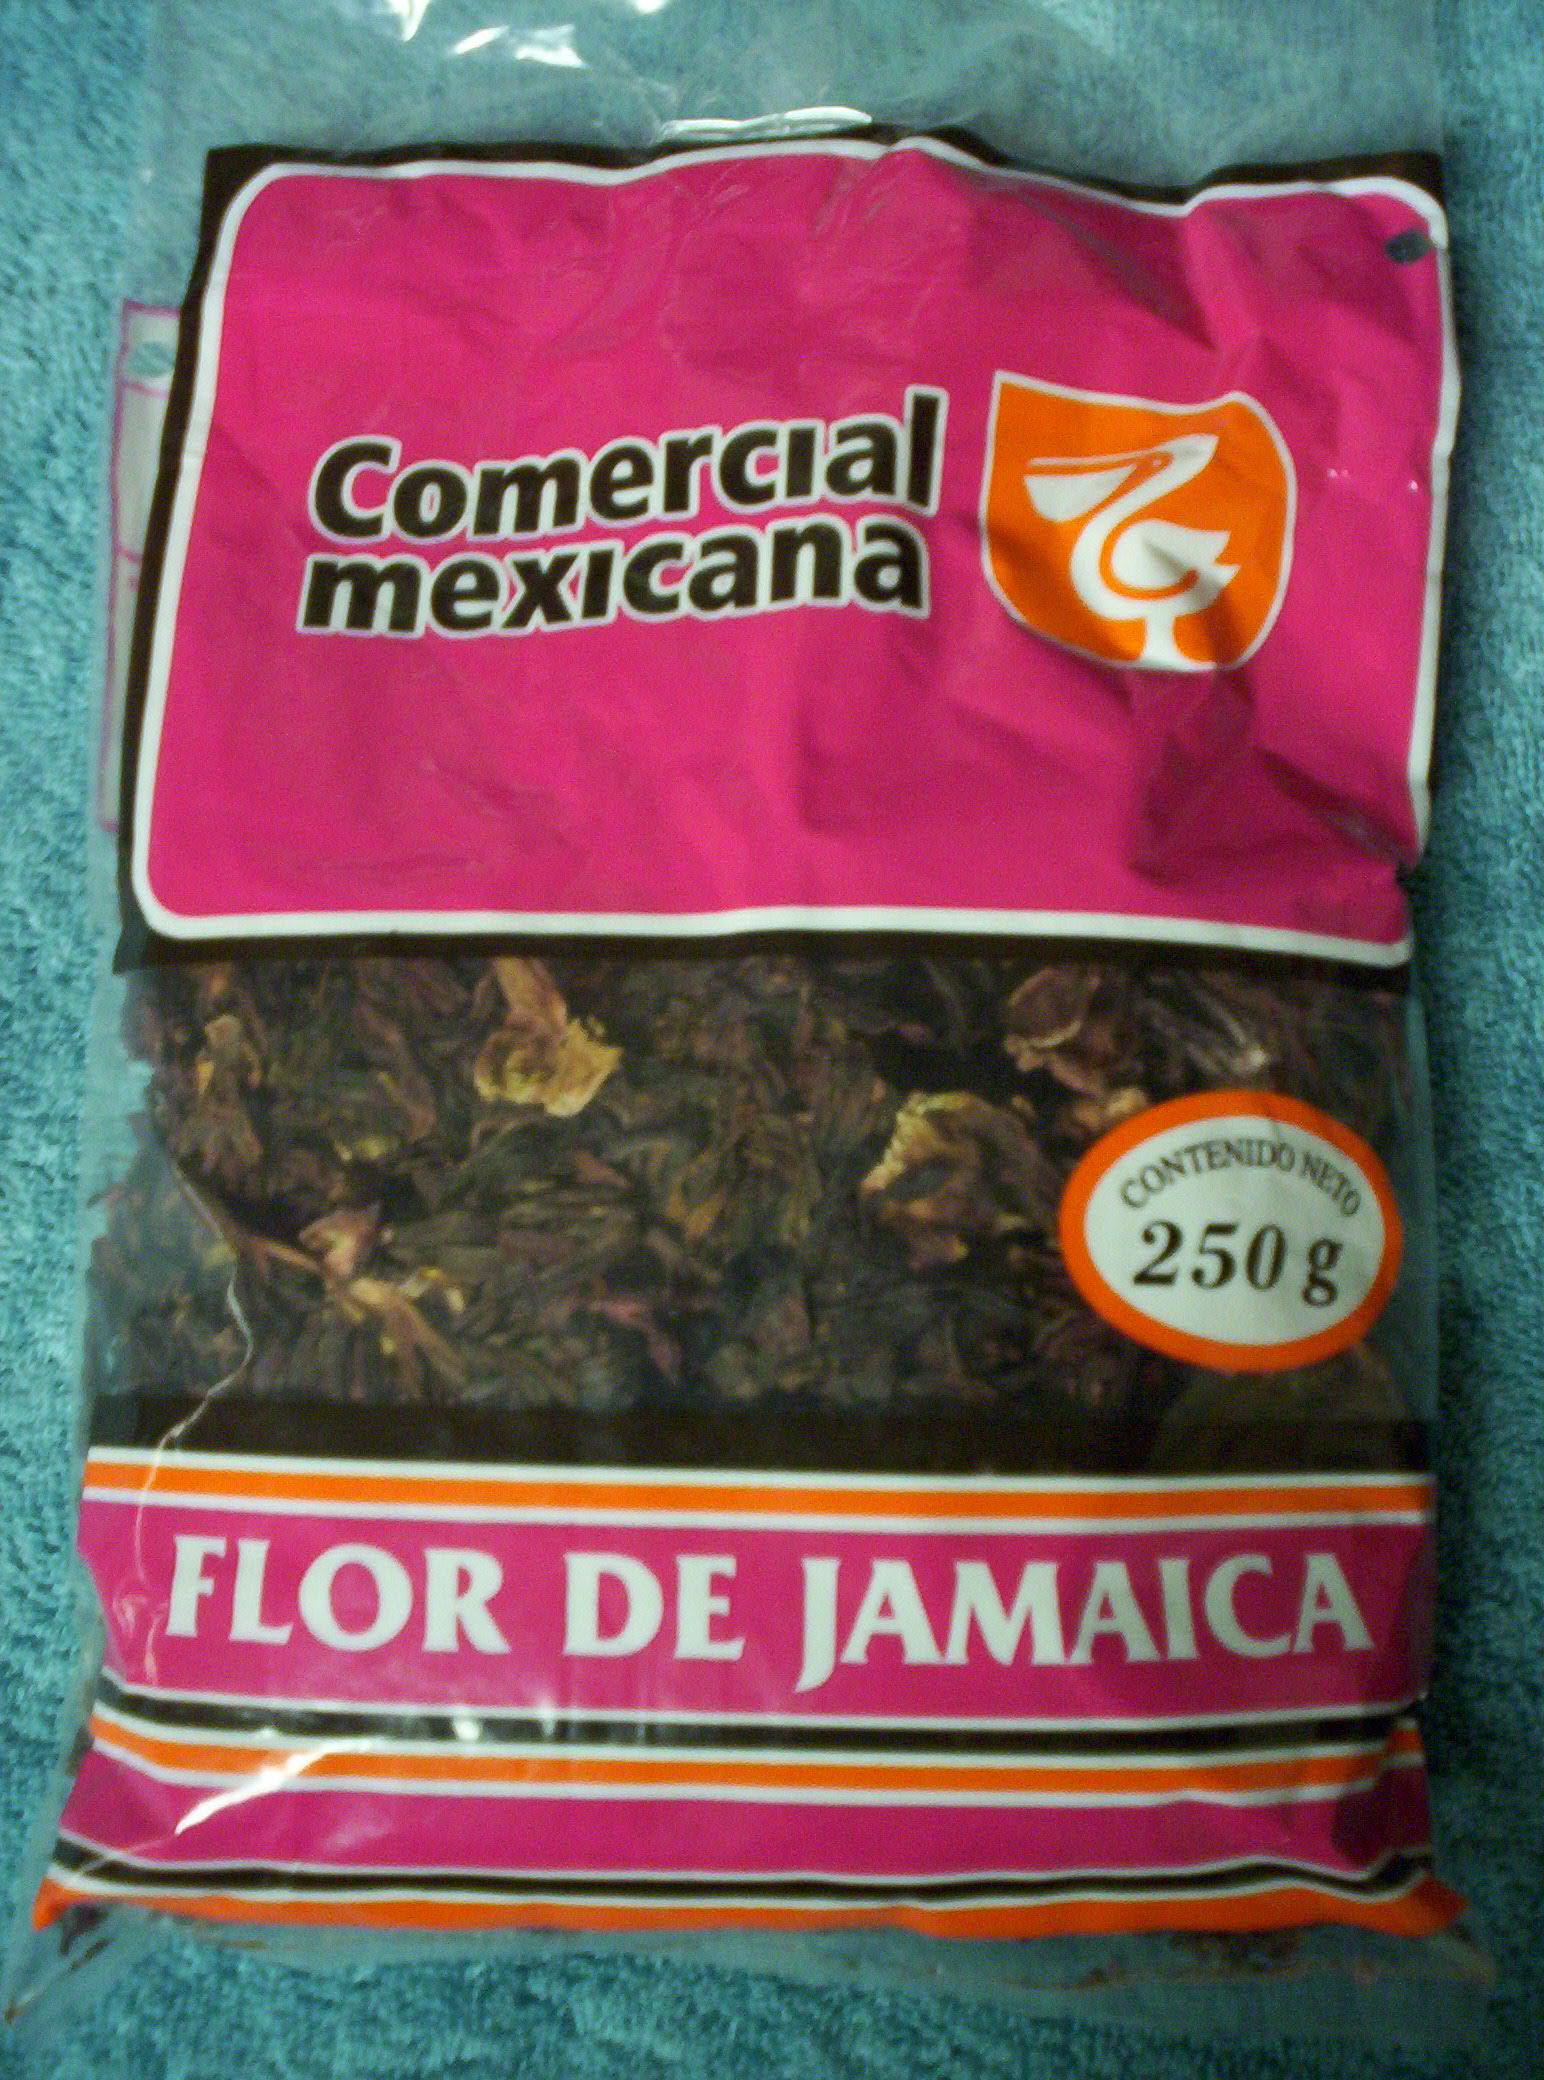 http://upload.wikimedia.org/wikipedia/commons/0/06/Flor_de_Jamaica.JPG